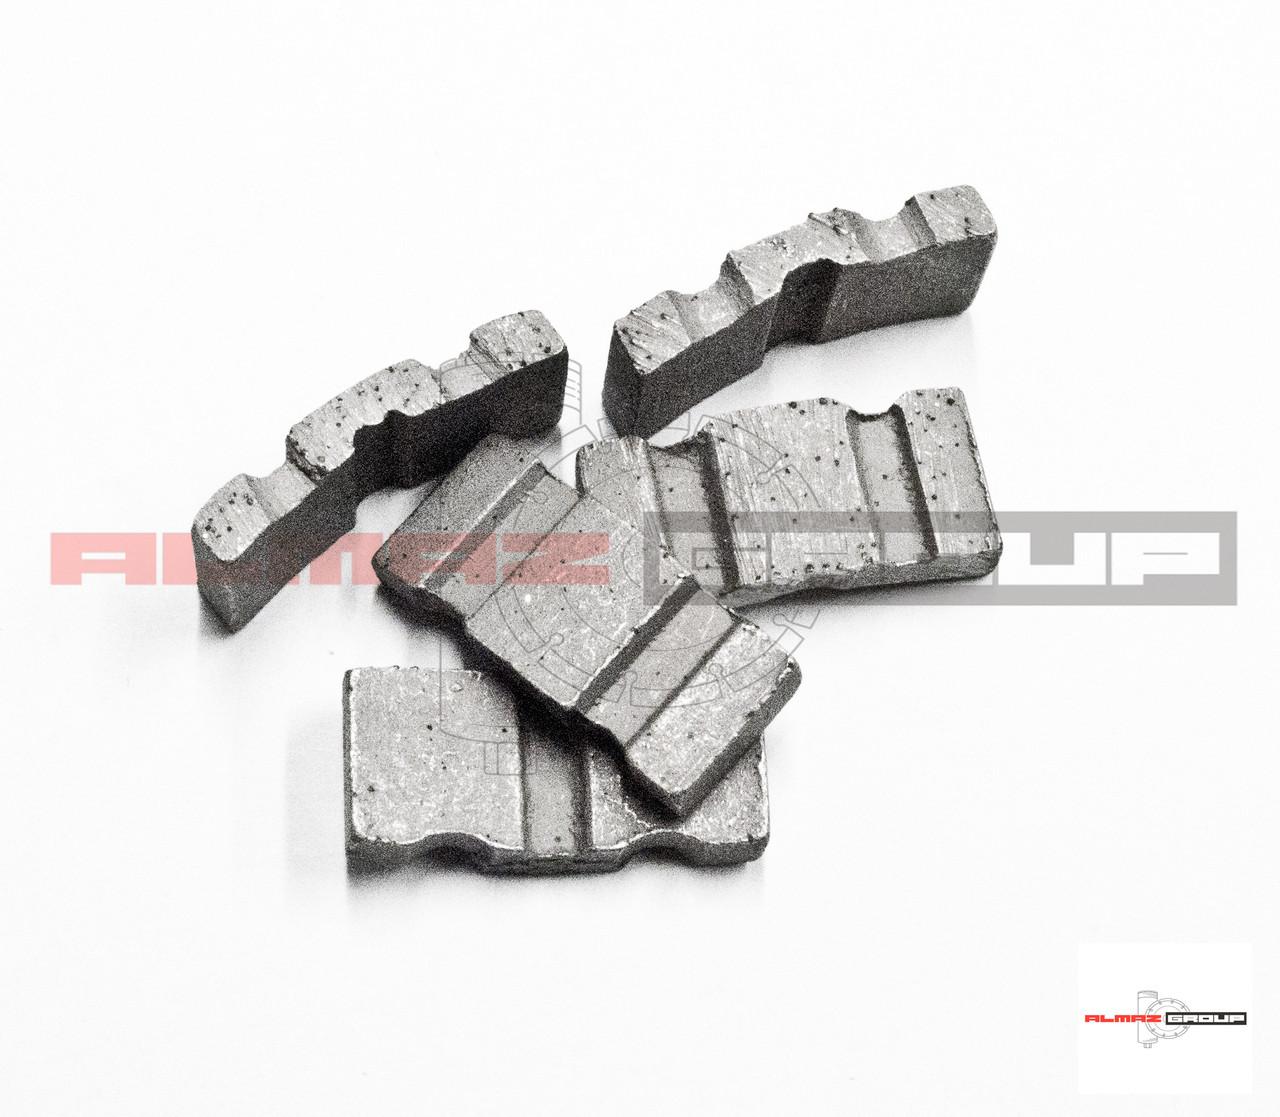 Реставрация алмазных коронок Ø 142 методом напайки сегмента TURBO-X